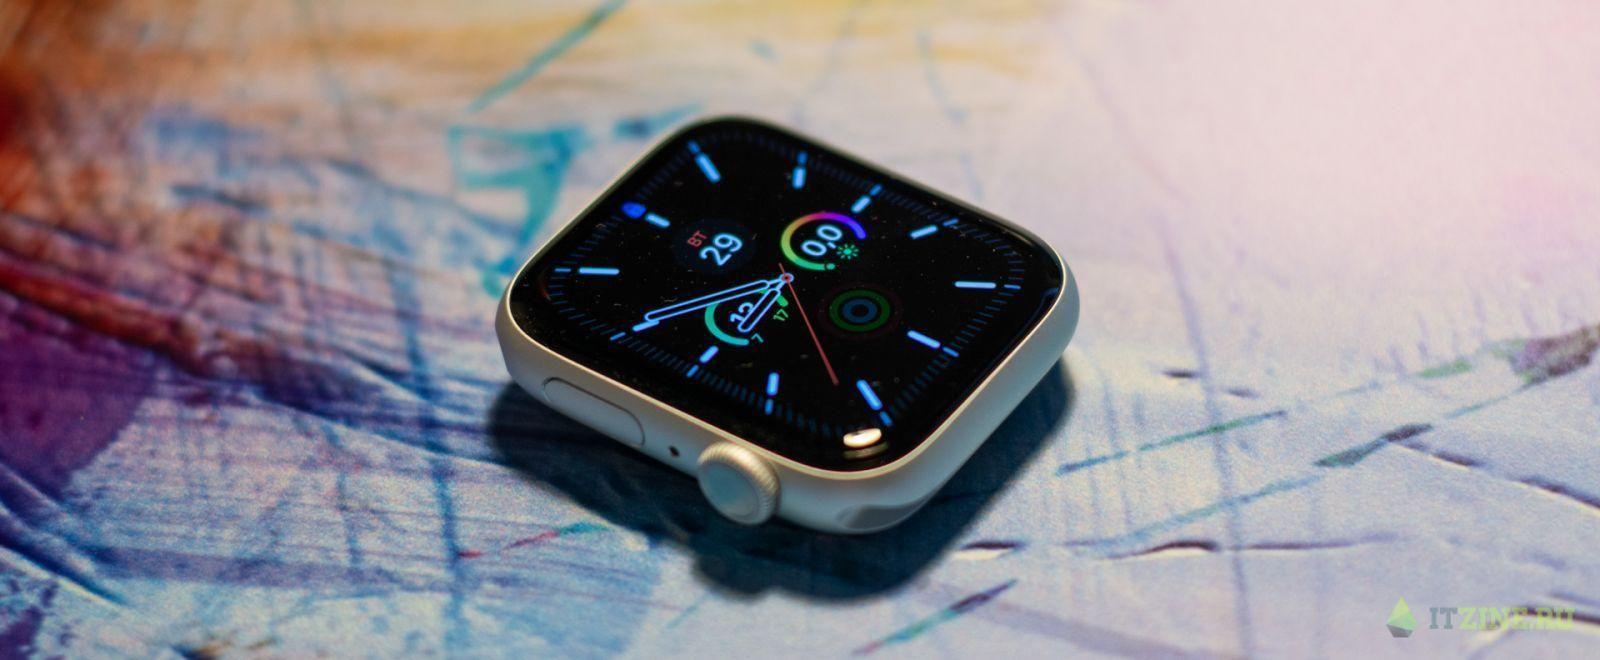 Часы Apple Watch series 6 во всей красе без ремешка